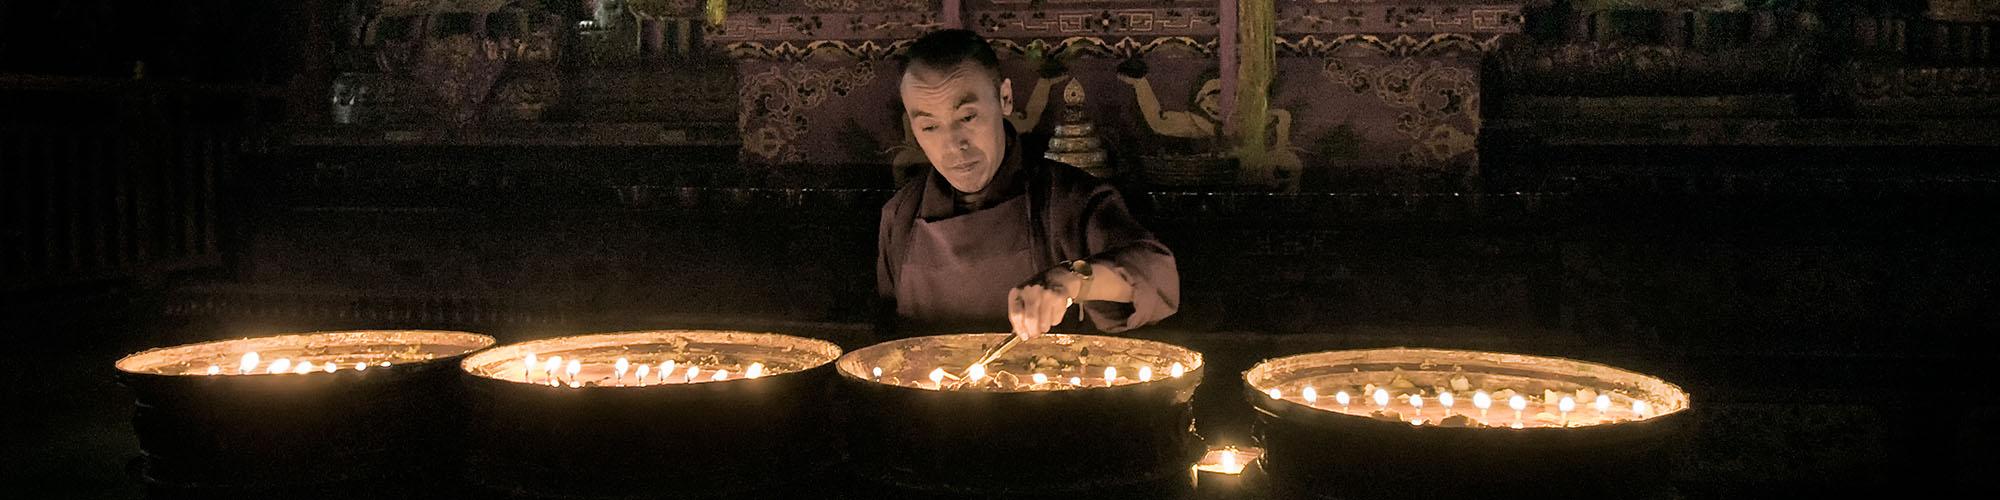 El Tíbet en India - El Pais Viajes